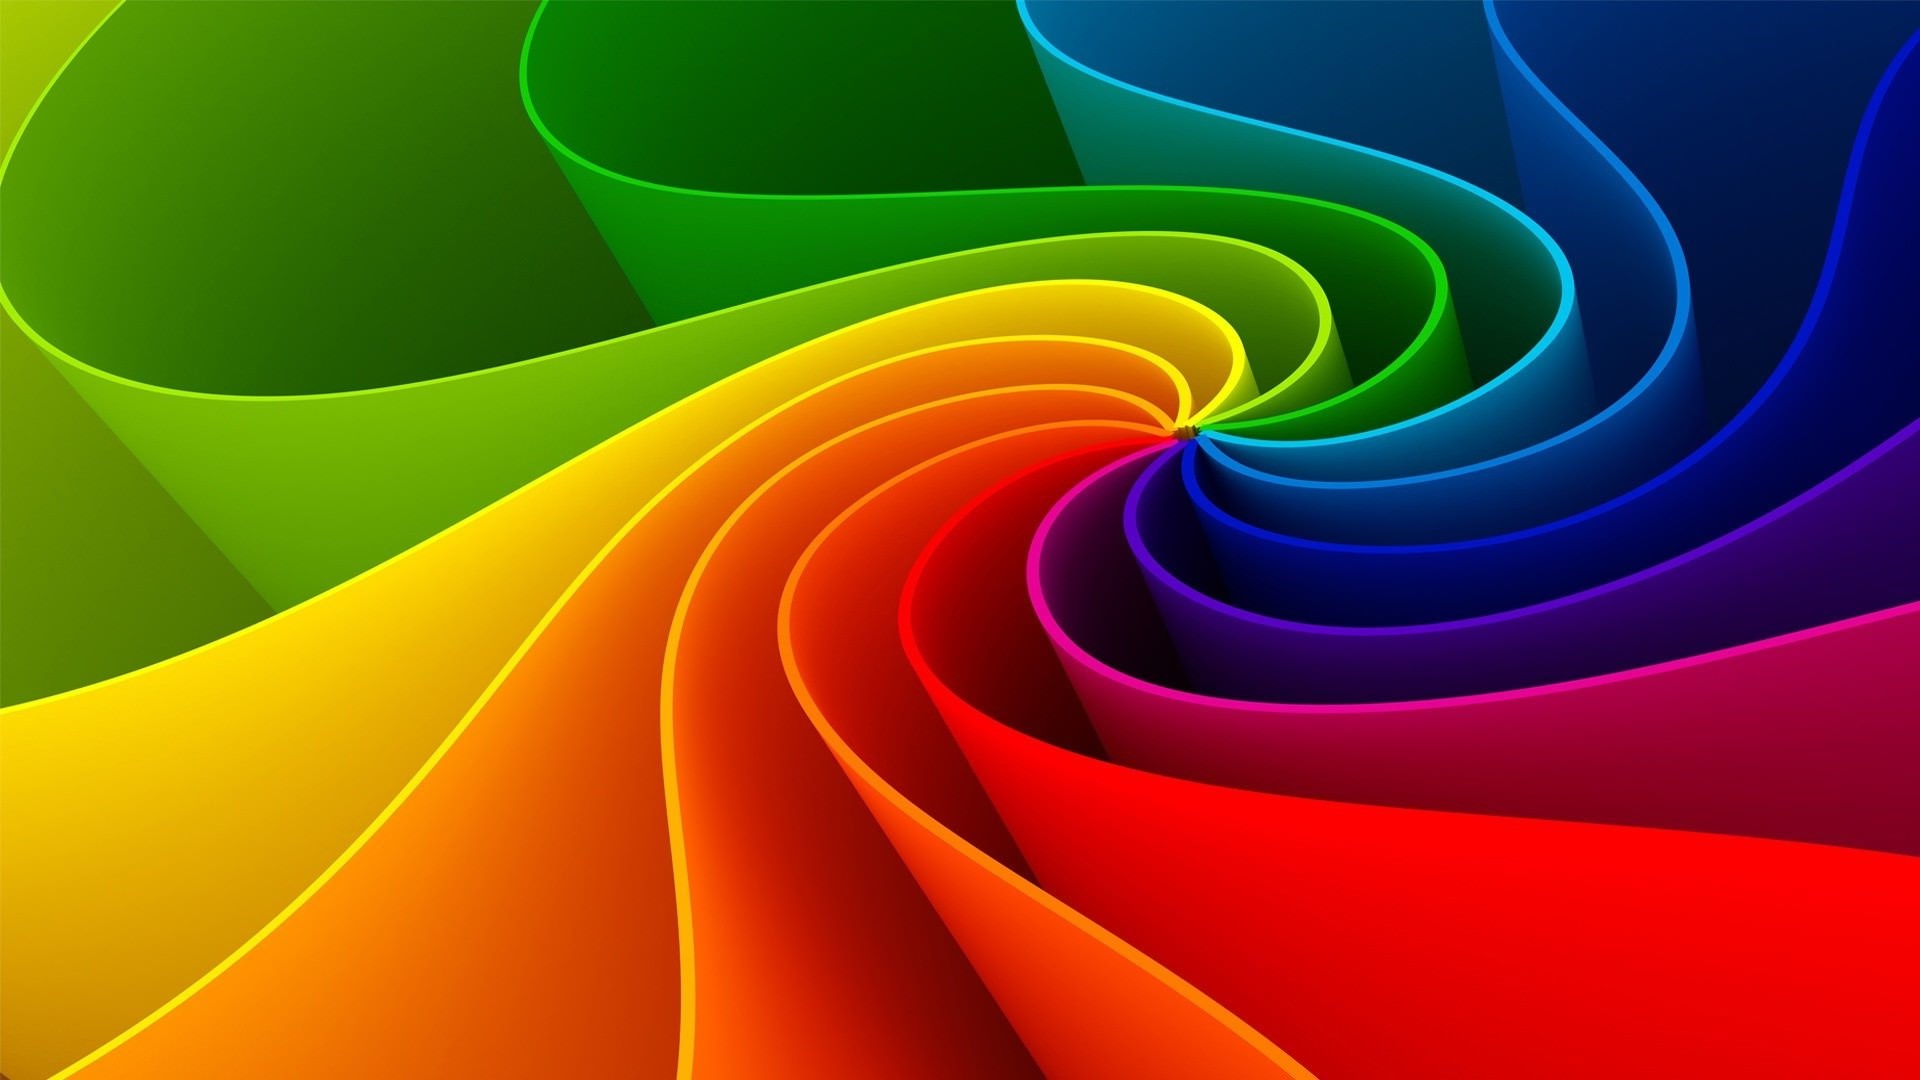 rainbow desktop wallpaper hd wallpapersafari